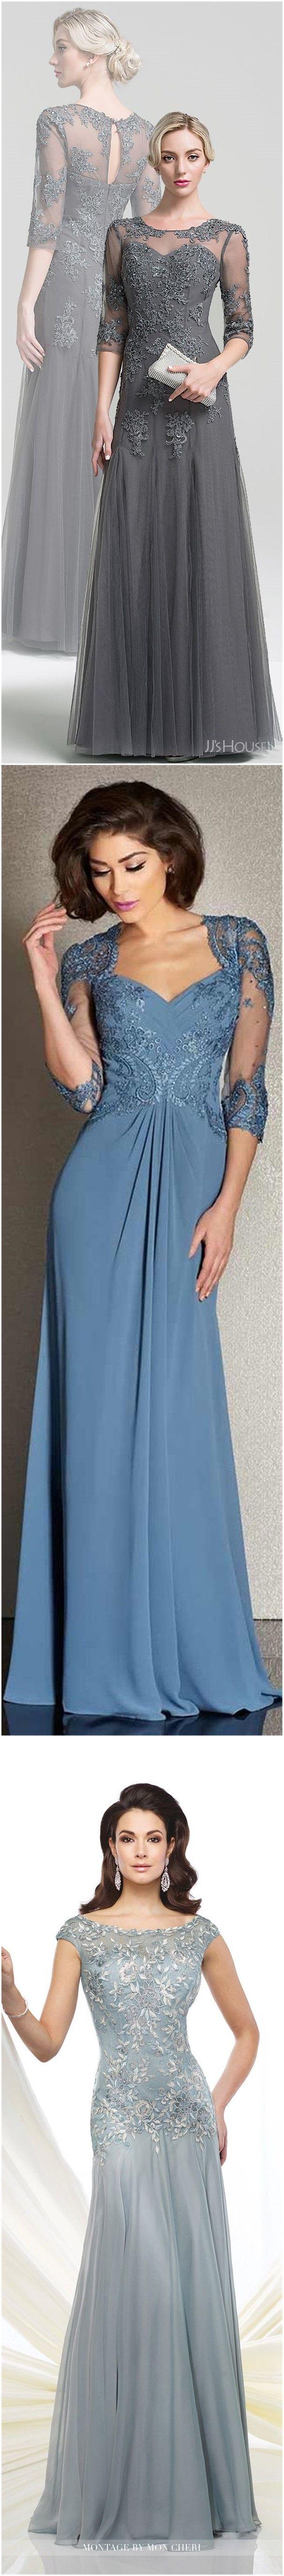 35 best Mother Of The Bride/Groom Dress images on Pinterest | Bridal ...